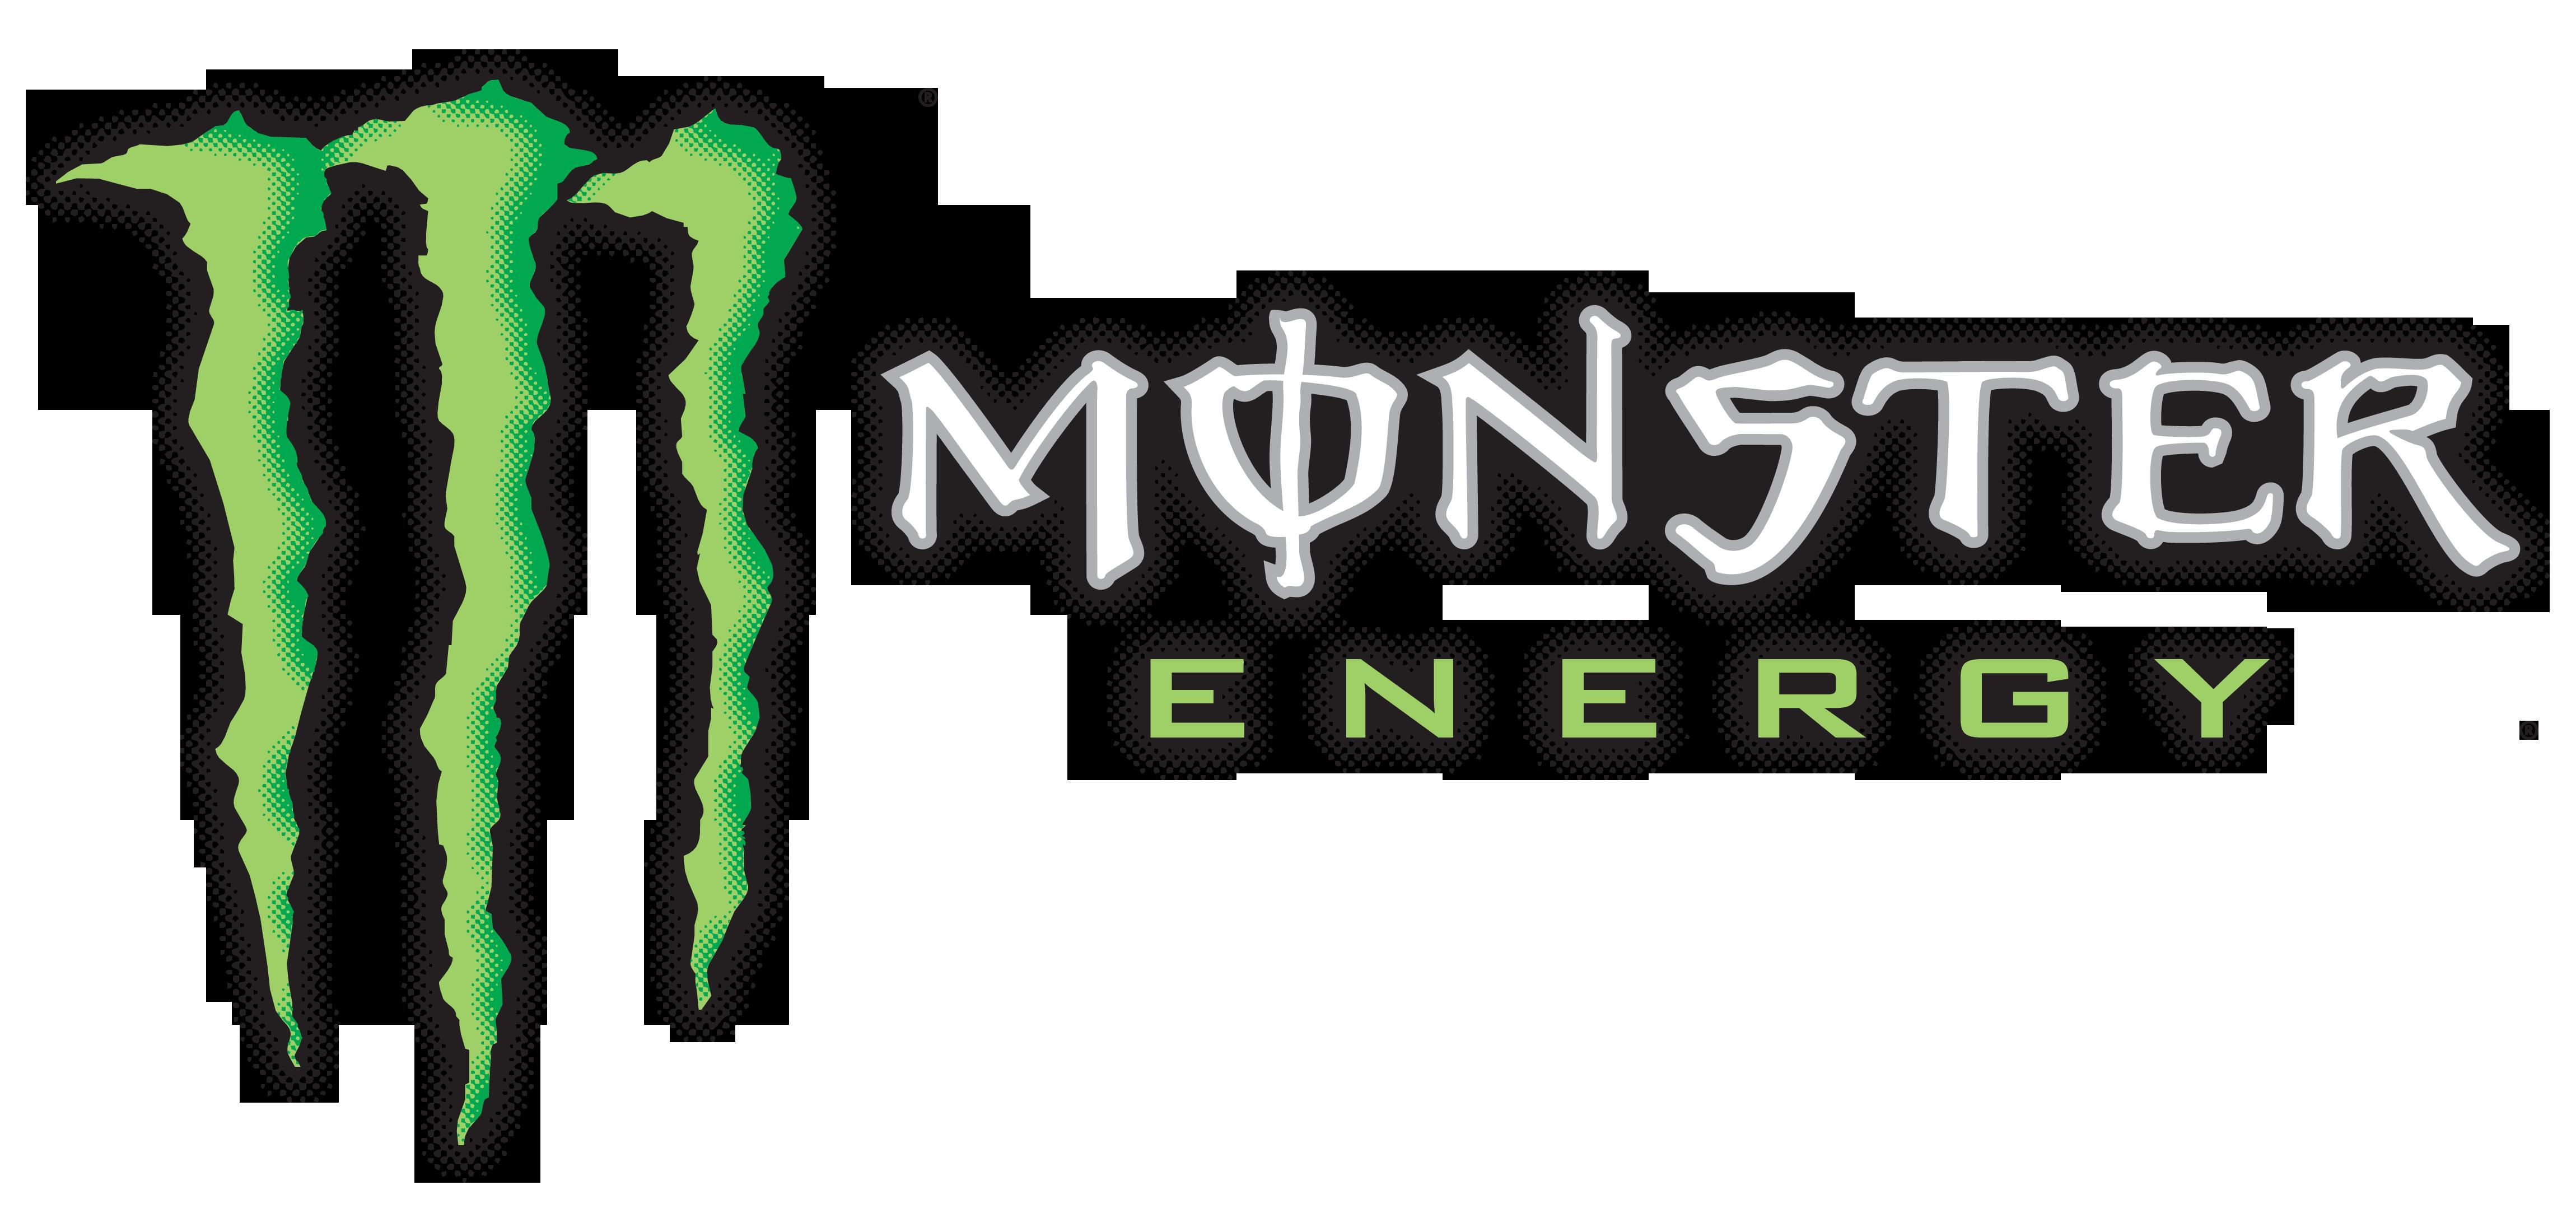 monster energy wallpapers  pictures  images lexus logo vector free download lexus logo vector eps